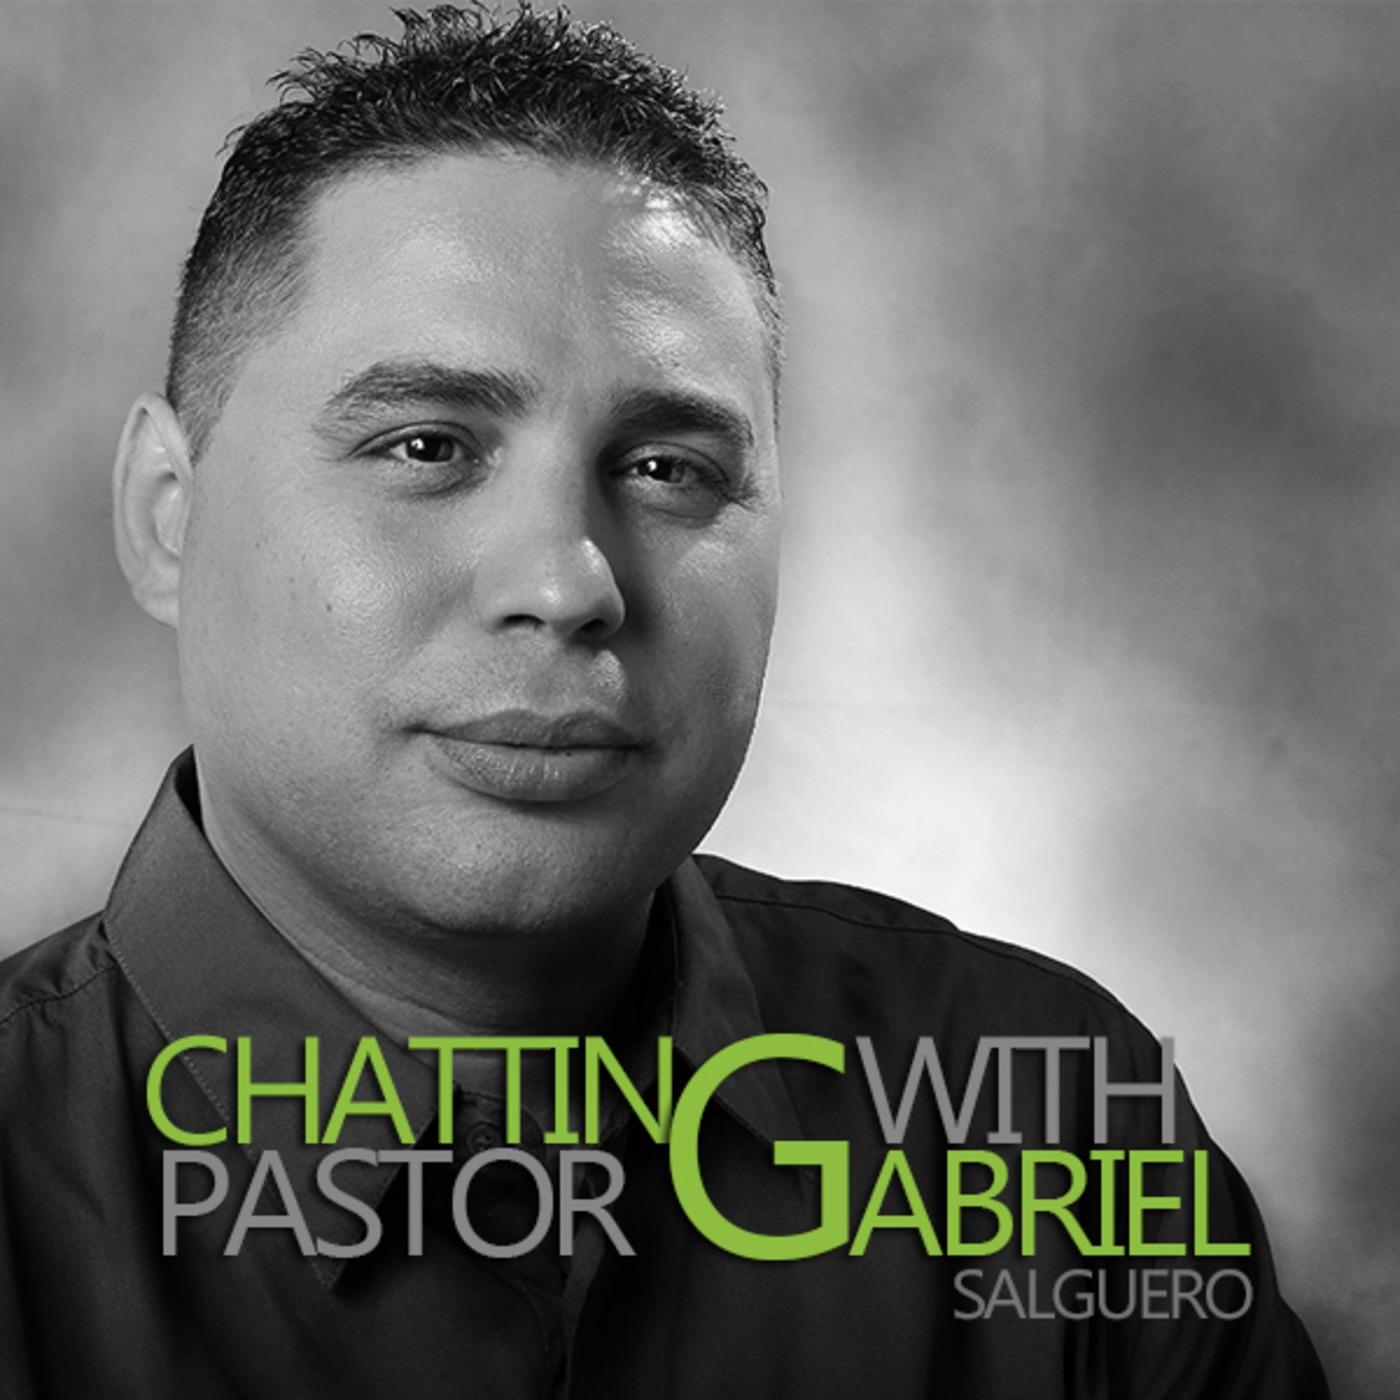 Pastor Gabriel Salguero